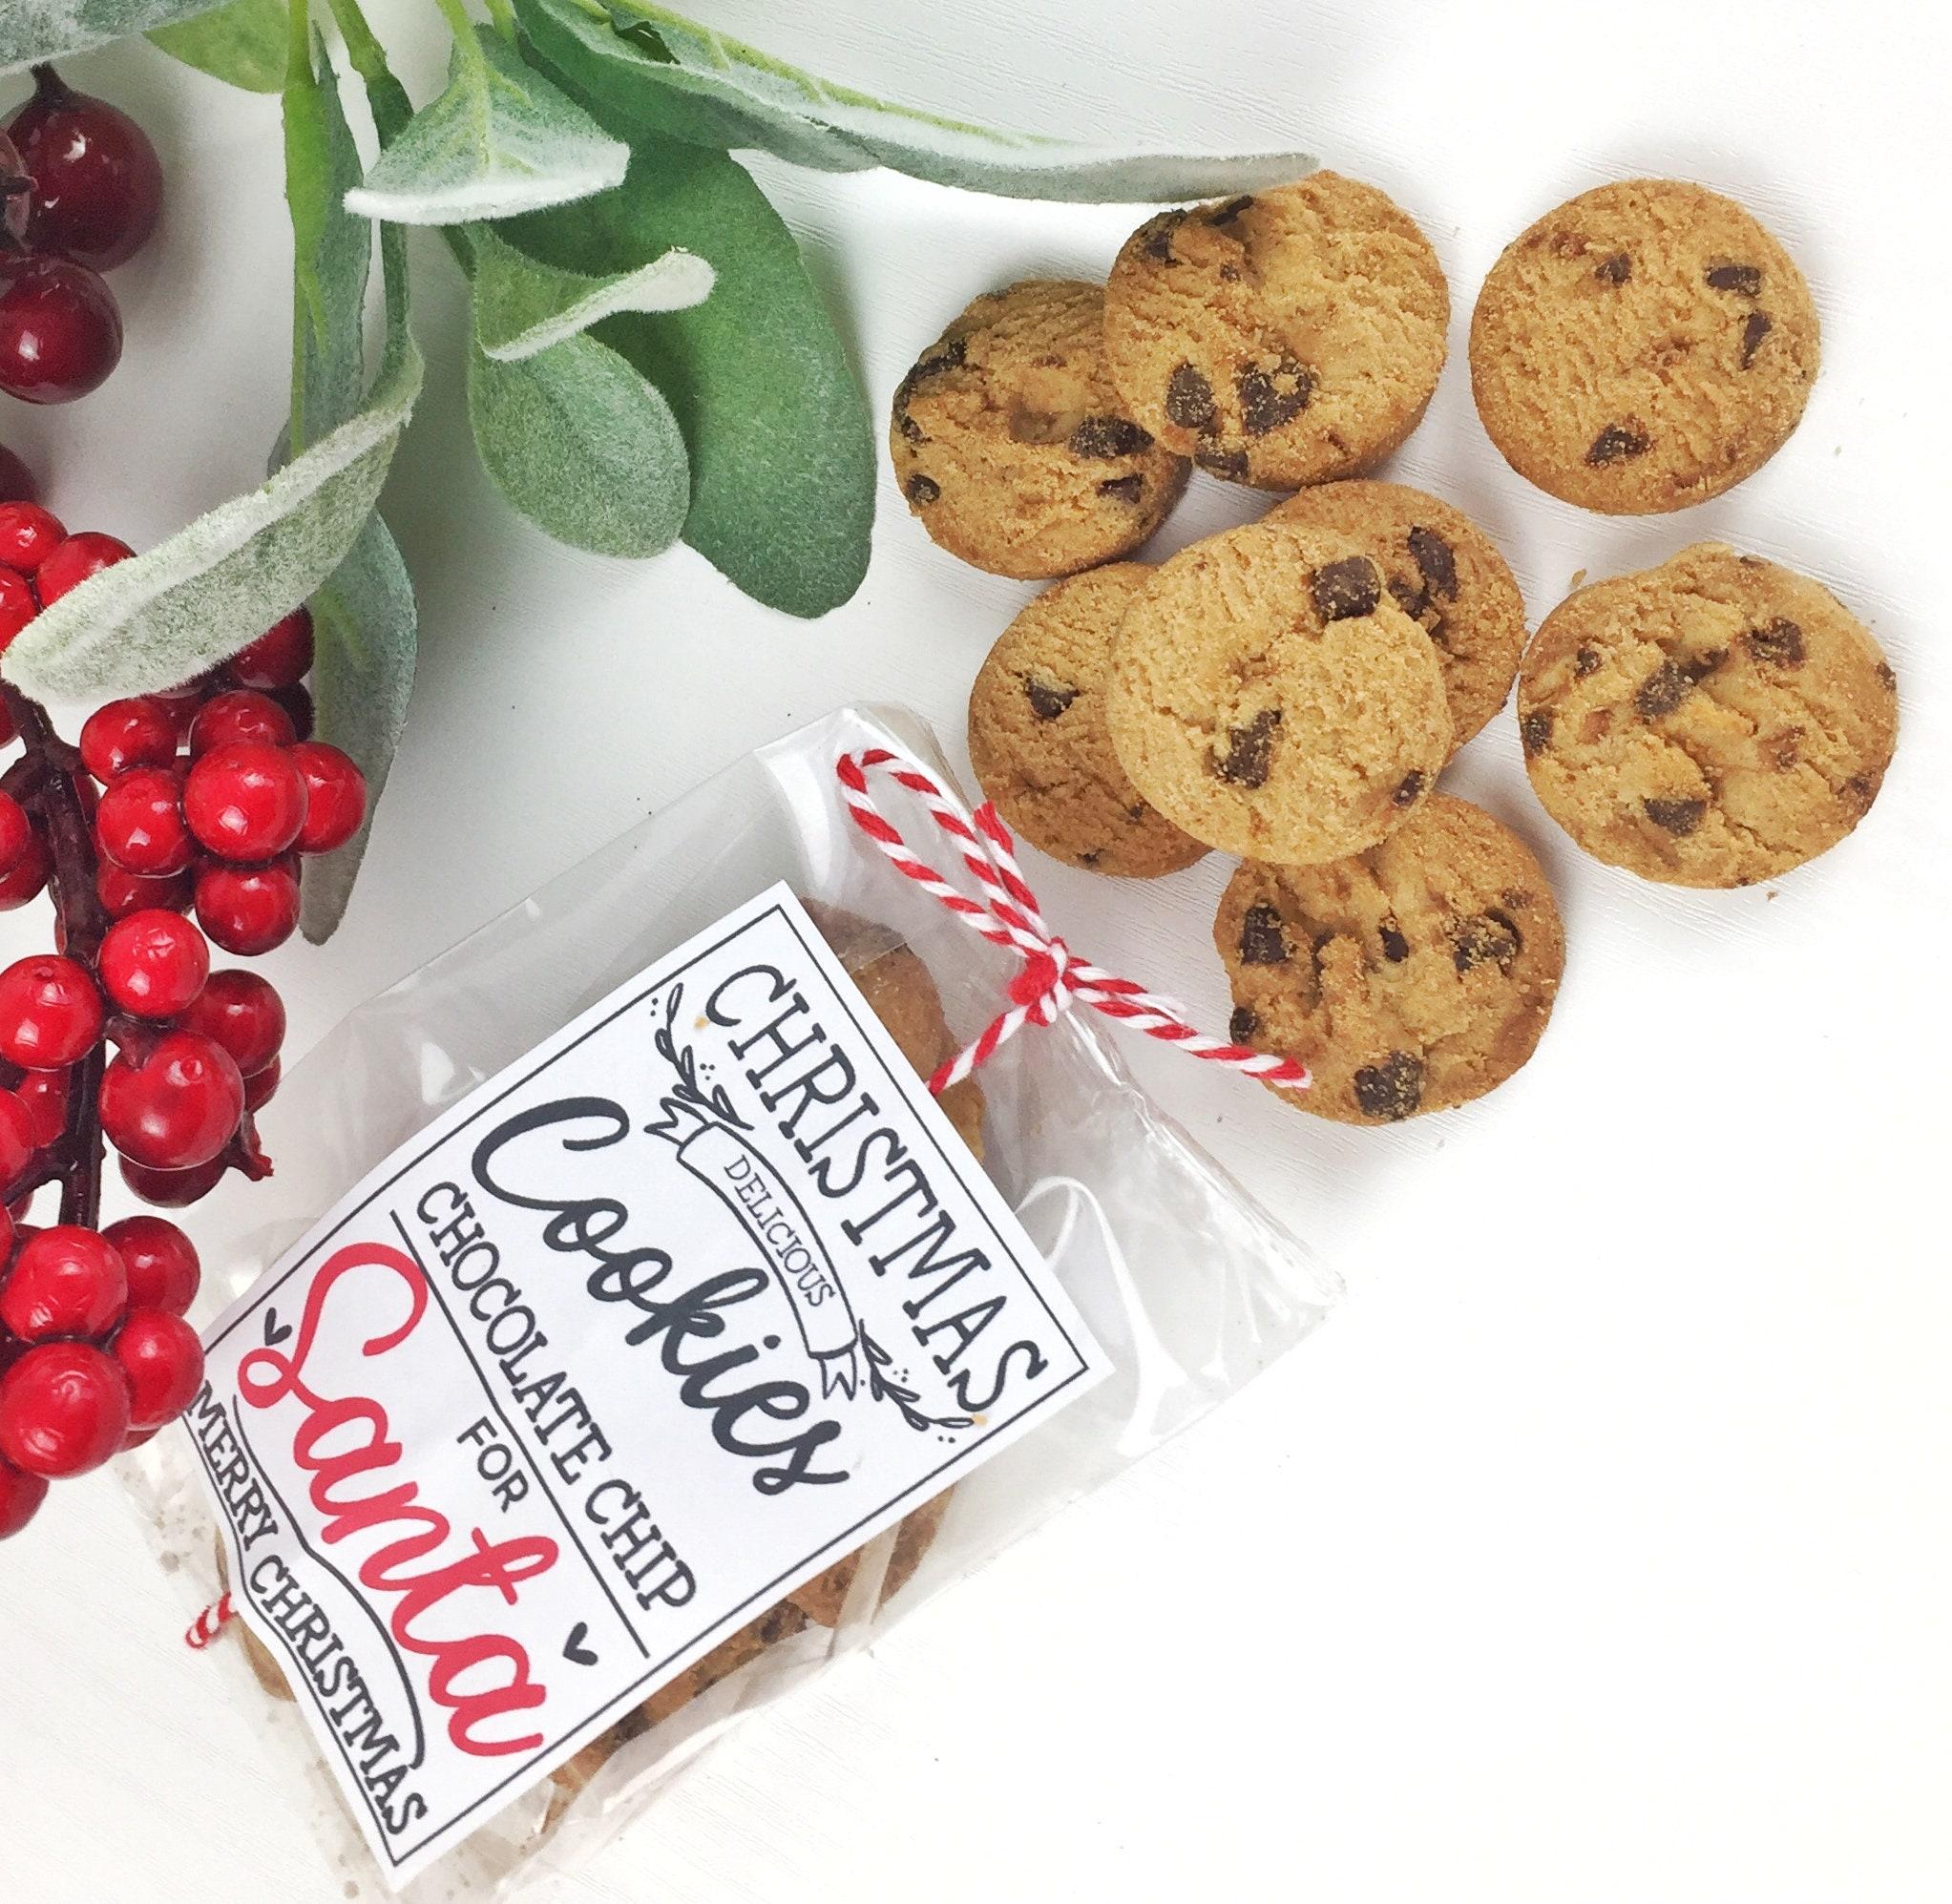 Bag of mini chocolate chip Cookies for Santa on Christmas Eve. | Etsy